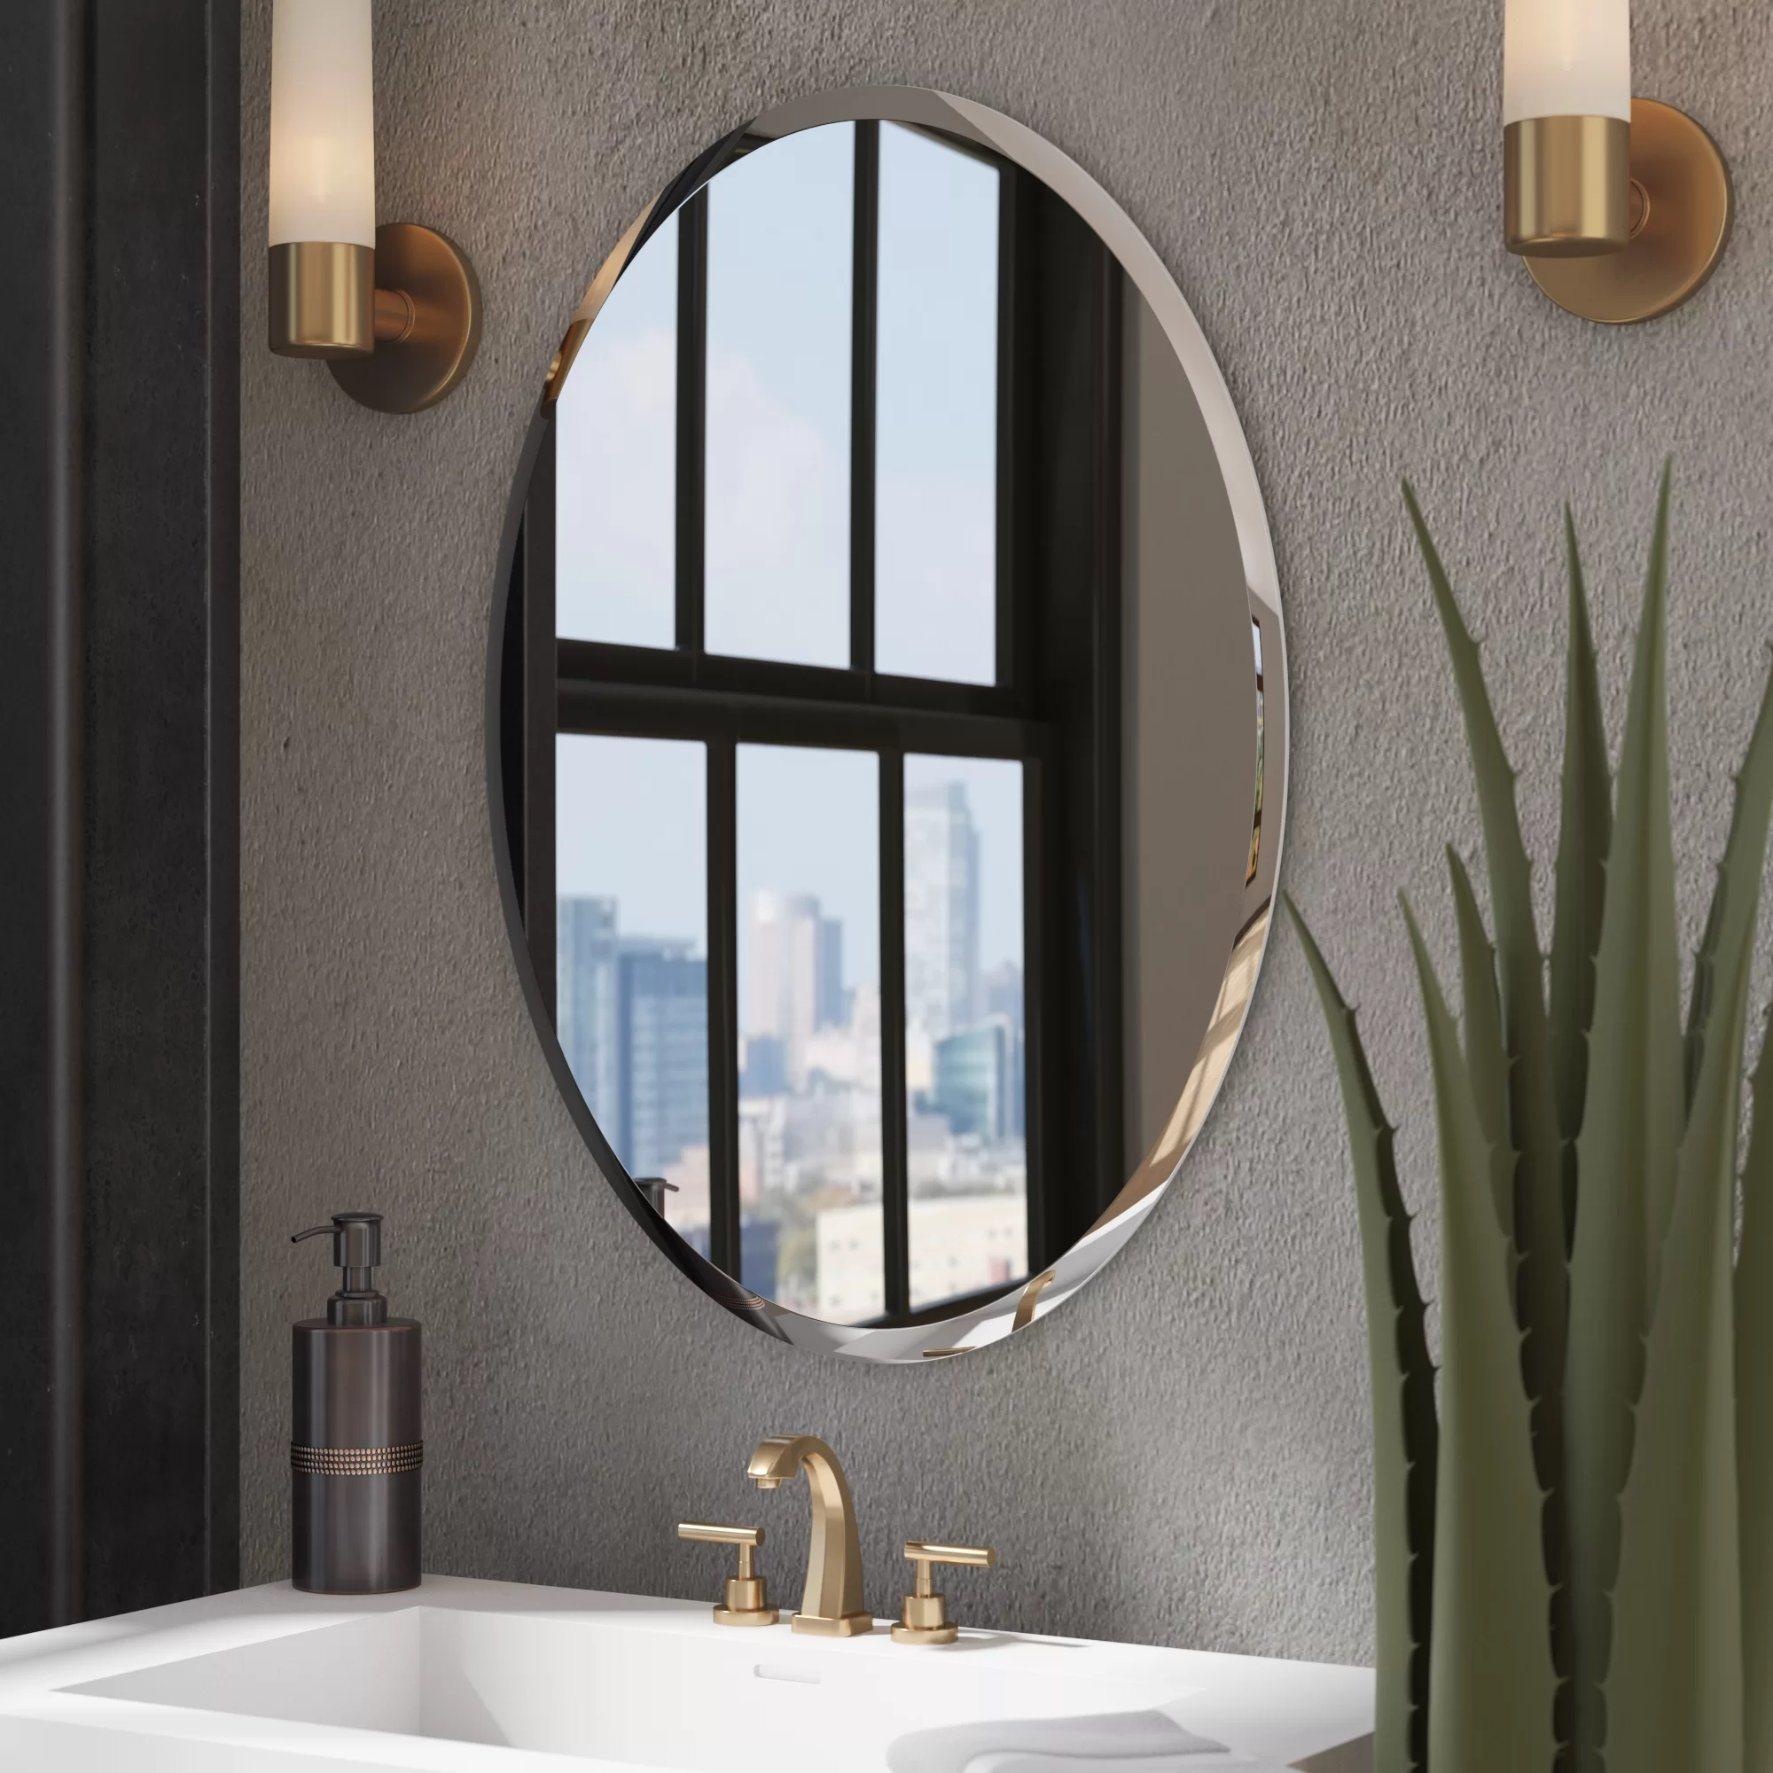 Wayfair mirrors for bathrooms child bike carrier rear